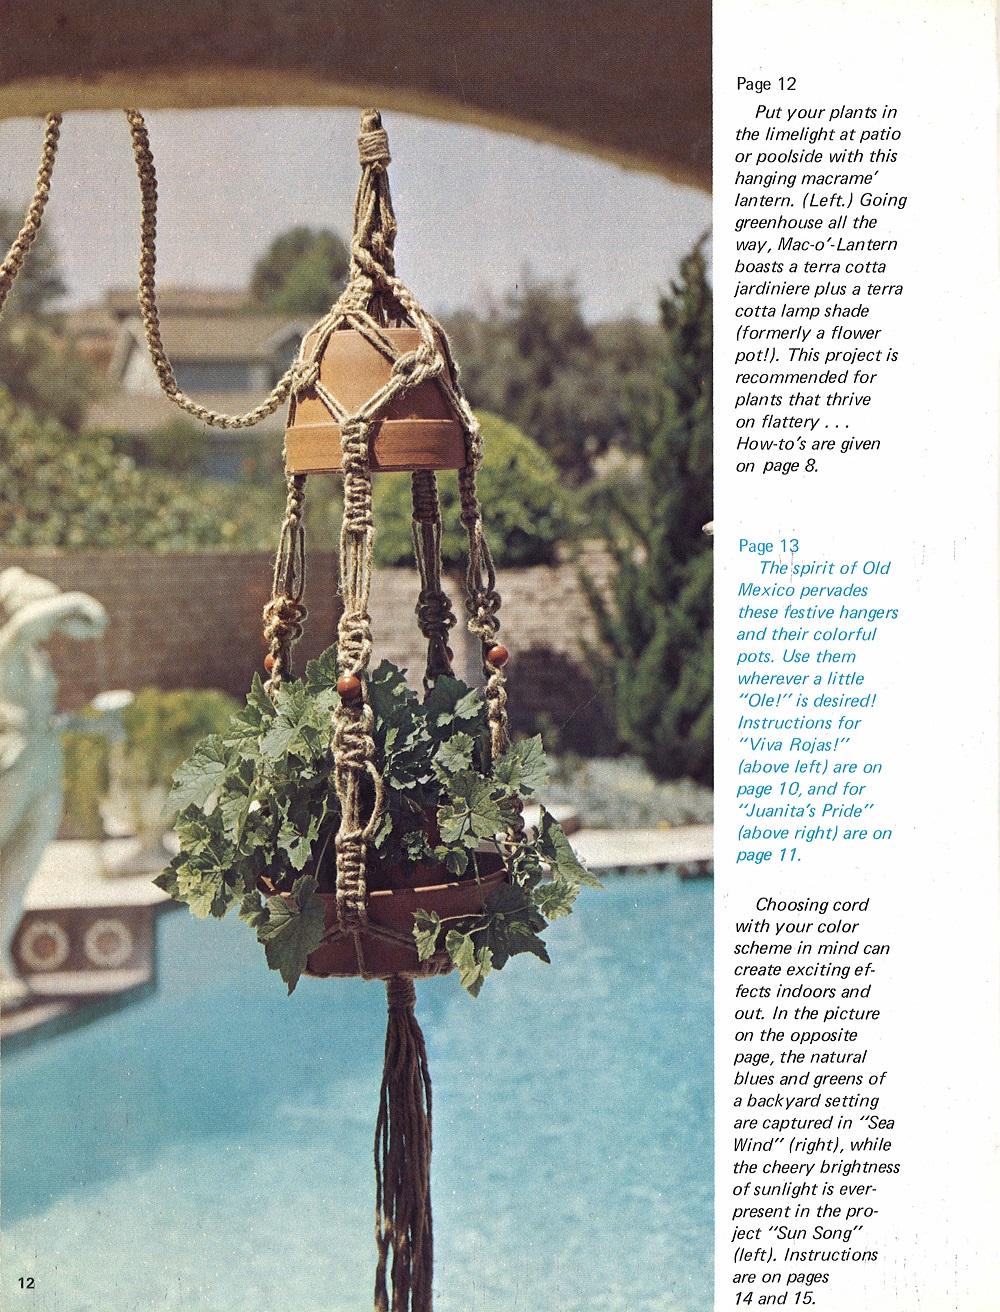 Easy To Make Macrame Pot Hangers Vintage Macrame Pattern Book Macrame Books